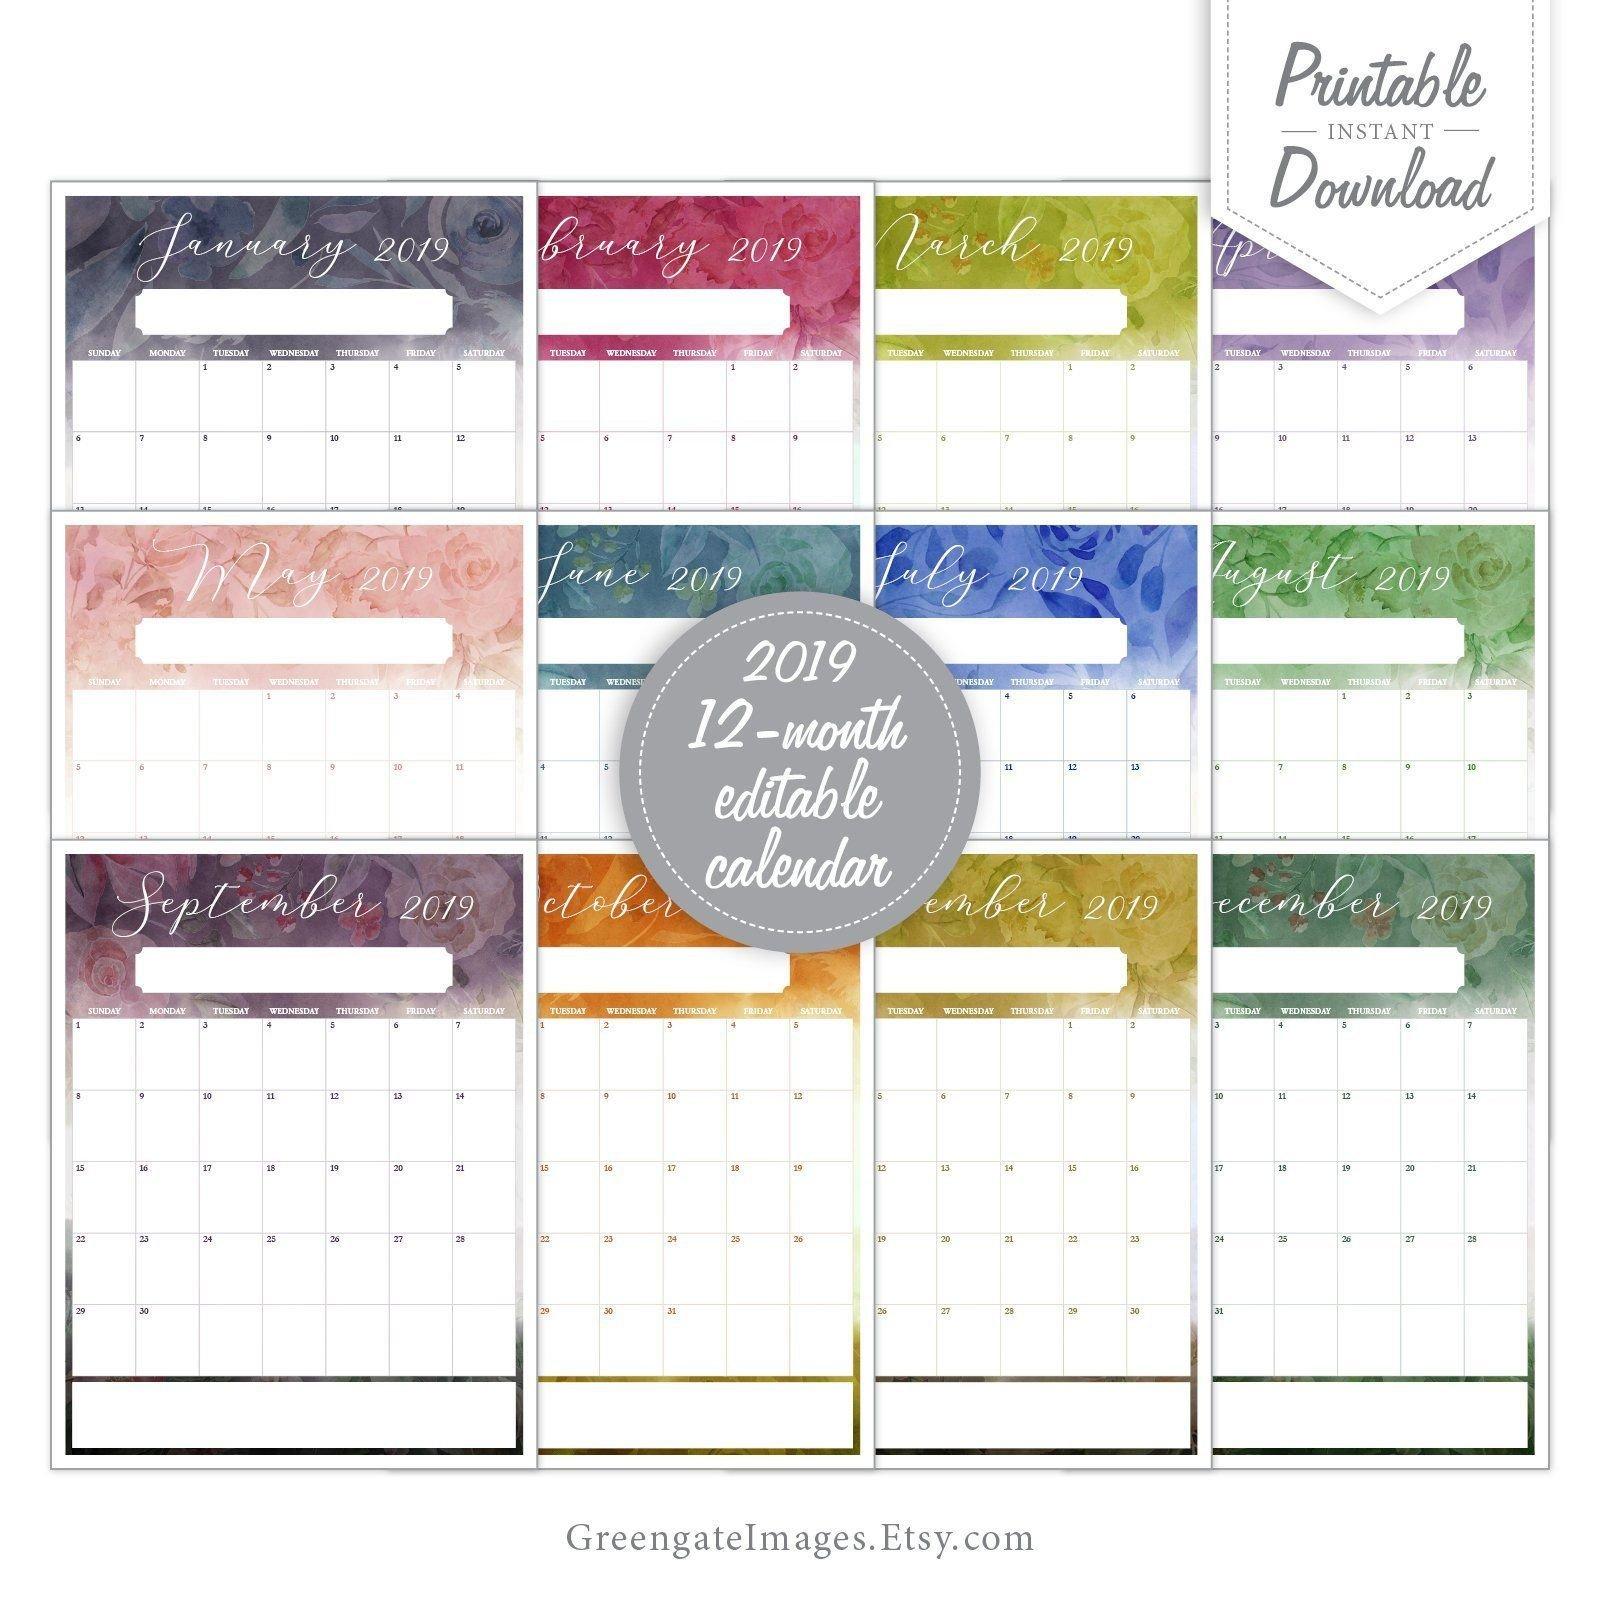 2019 Editable Calendar - Fillable Calendar, 12 Month 12 Months Calendar Editable